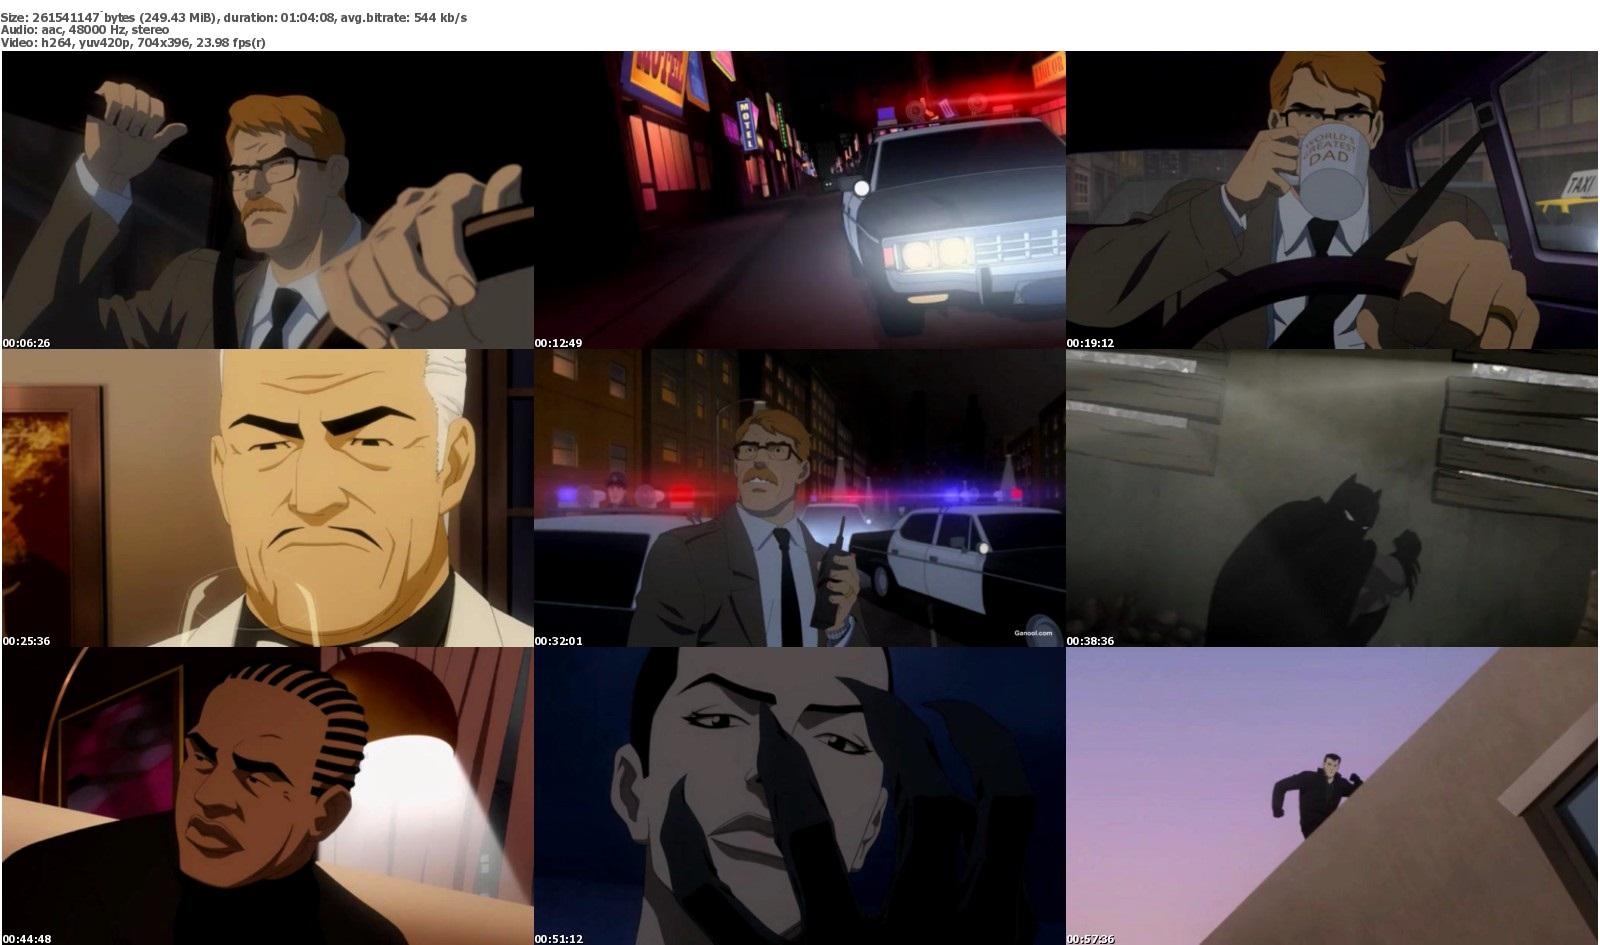 http://2.bp.blogspot.com/-cDkYvumylwk/TpOtnq89_zI/AAAAAAAAAzo/aVEJ3LTxAPw/s1600/Batman+Year+One+%25282011%2529.jpg2.jpg